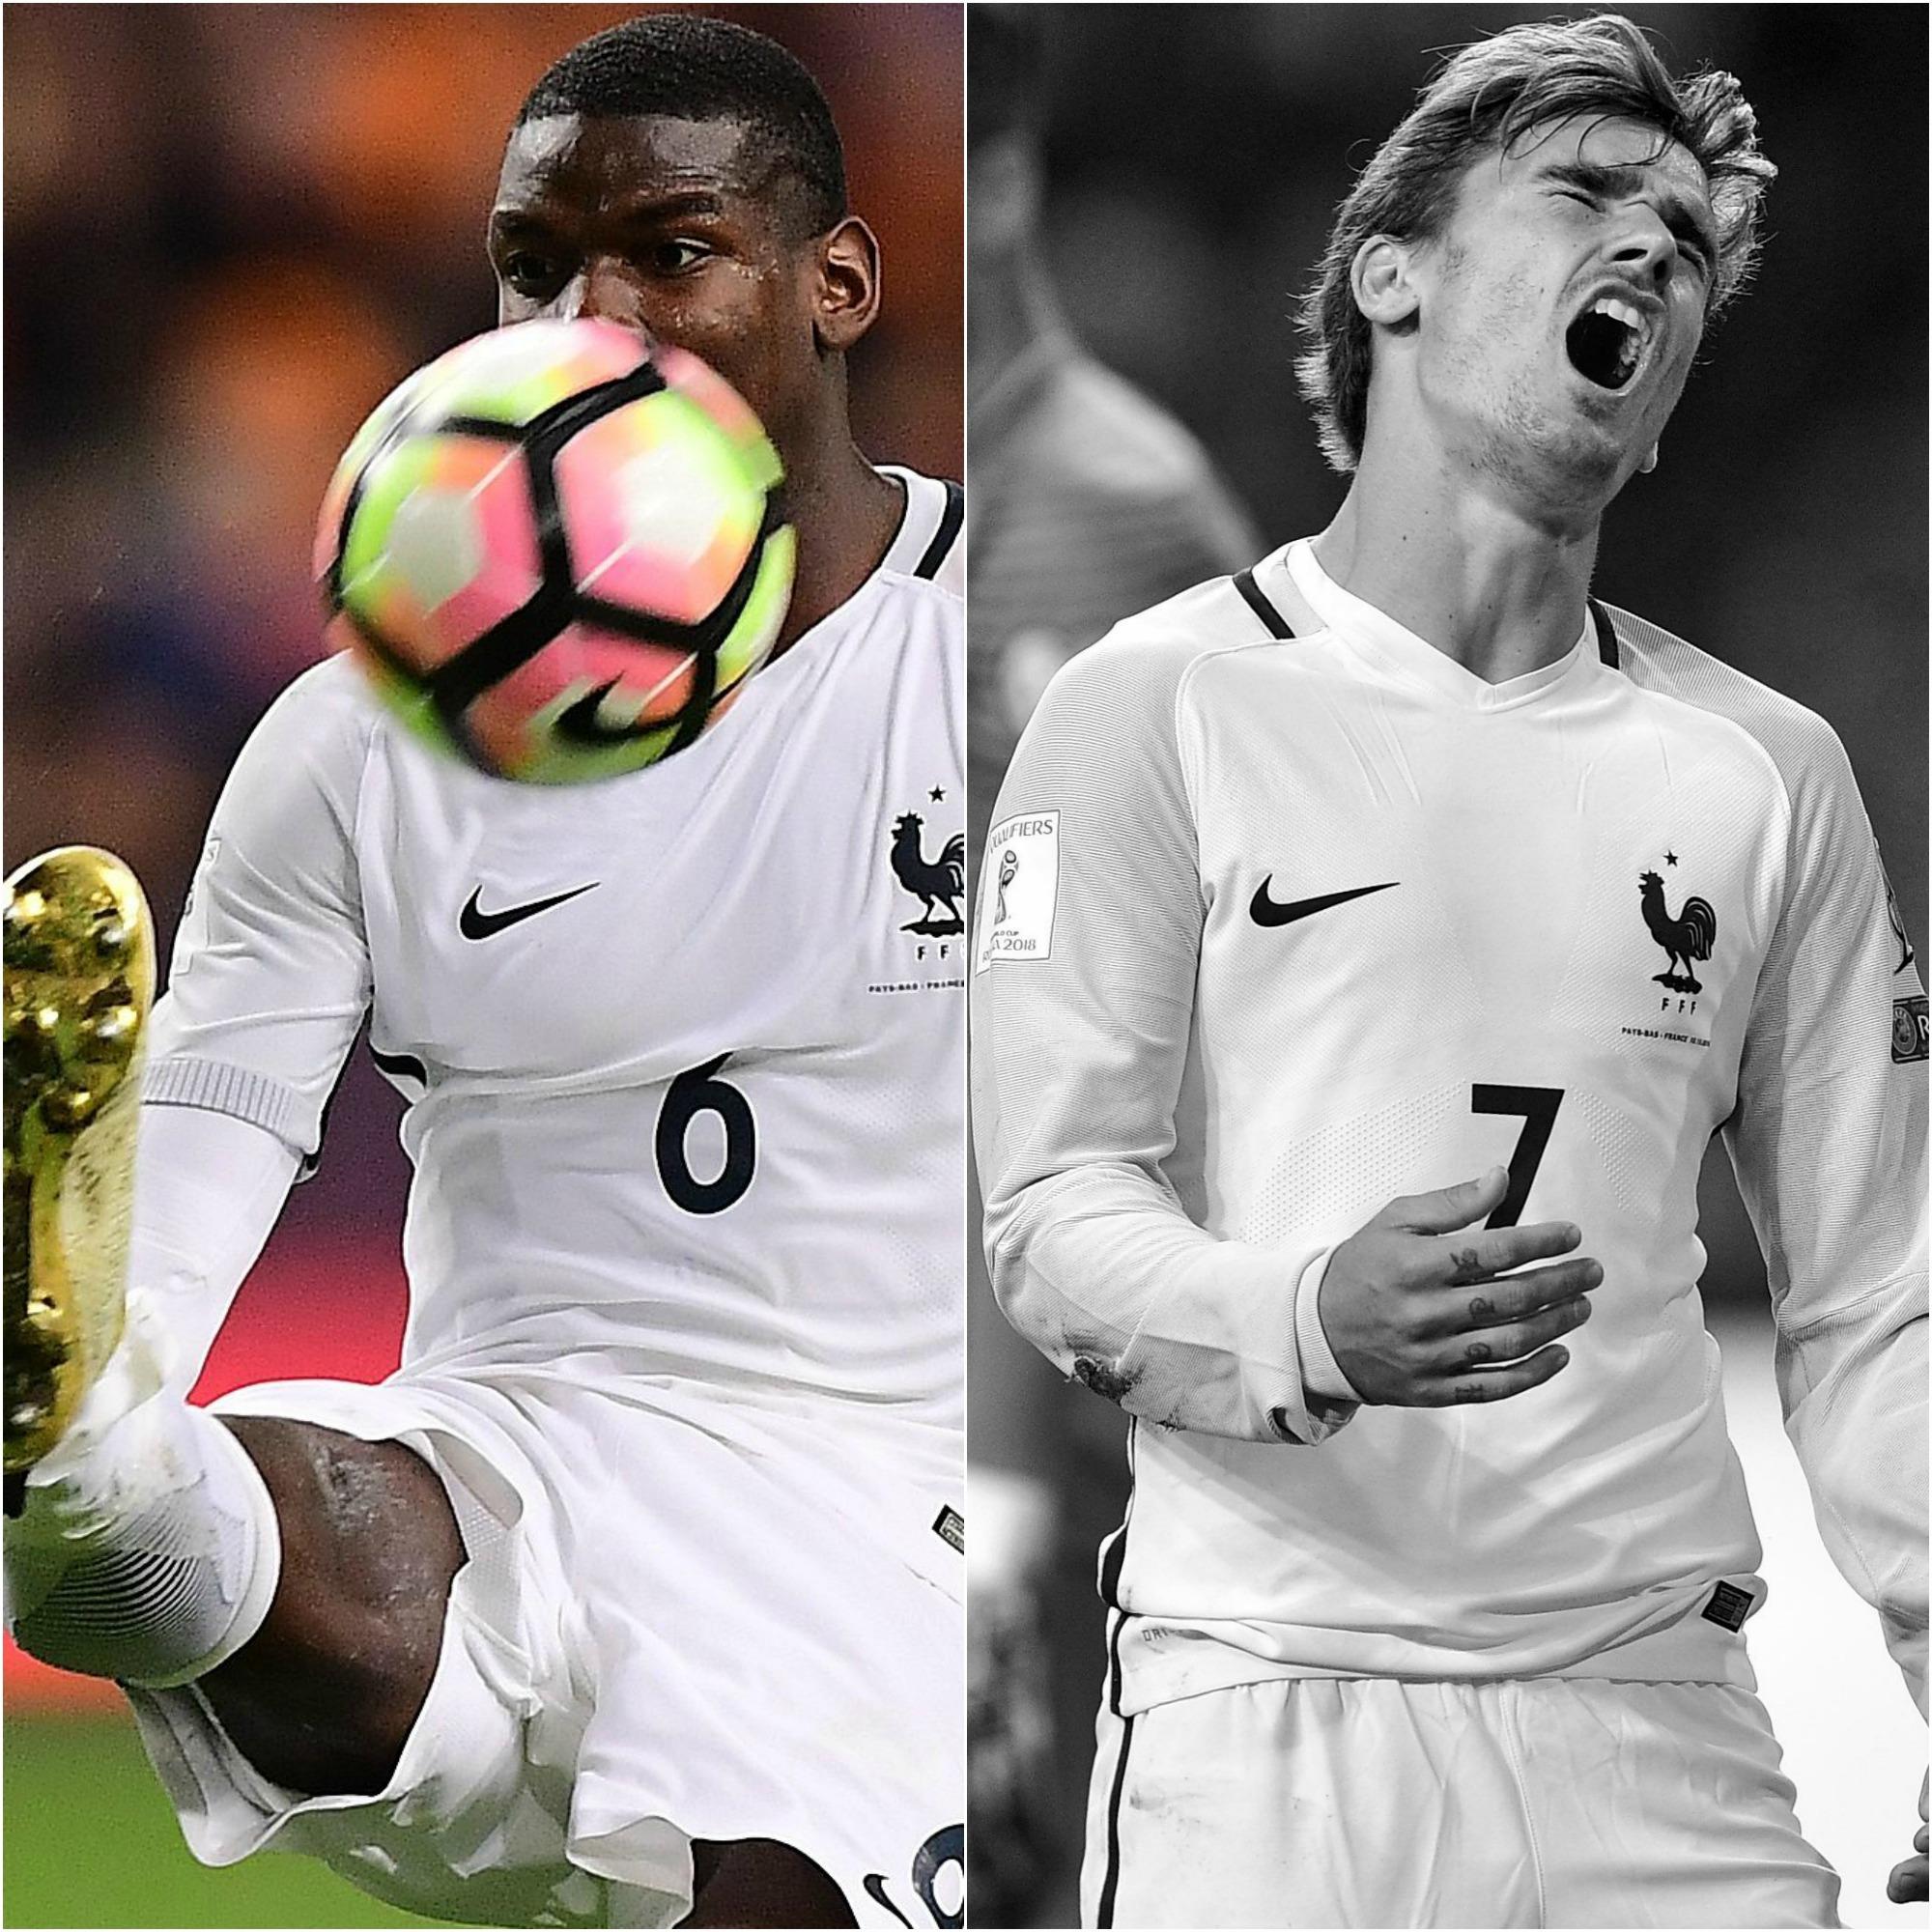 Football - Equipe de France - Les notes des Bleus : Pogba en transe, les attaquants en souffrance